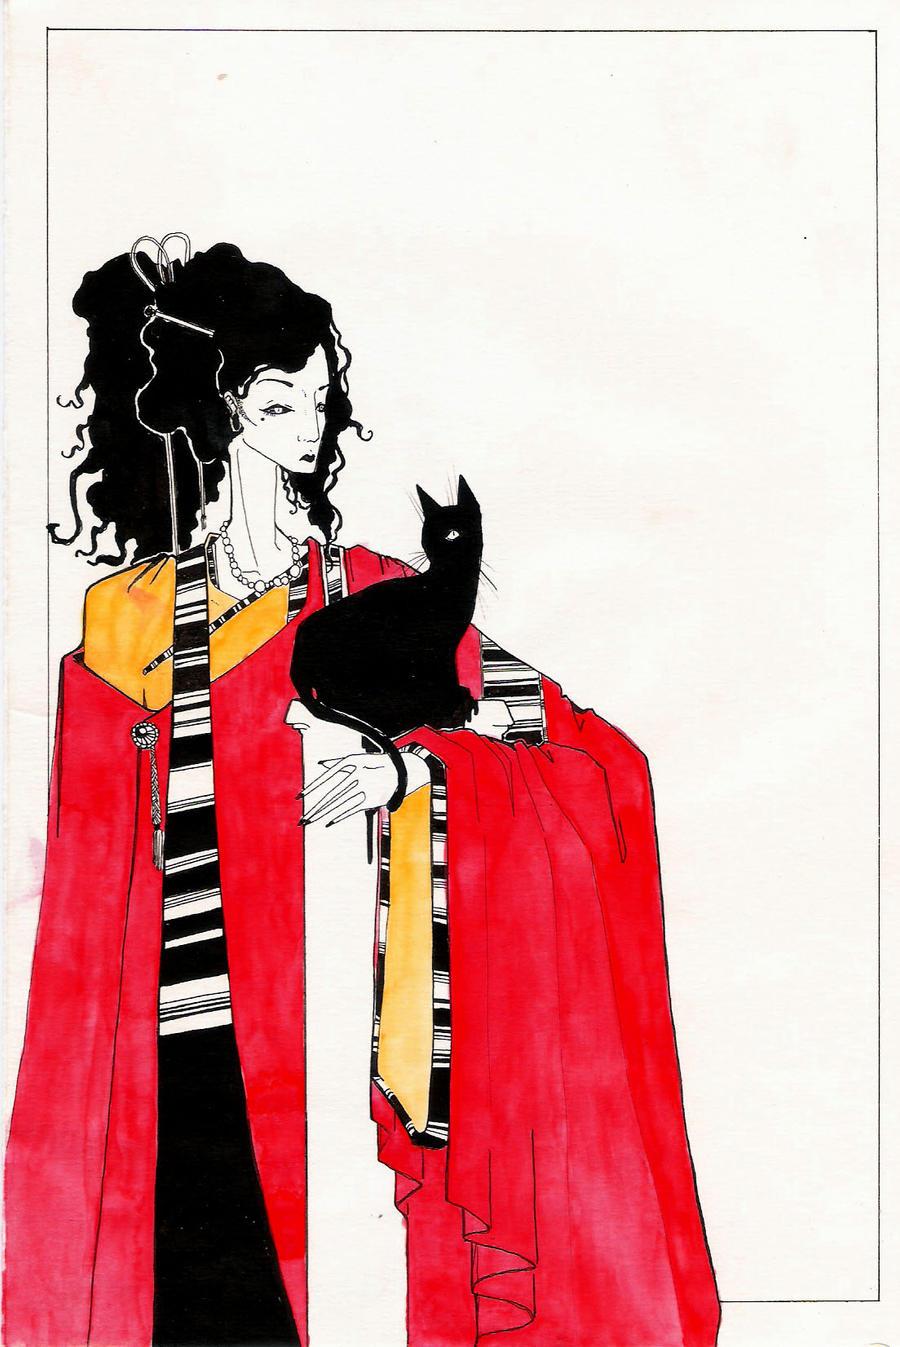 The Black CaT by carminausher